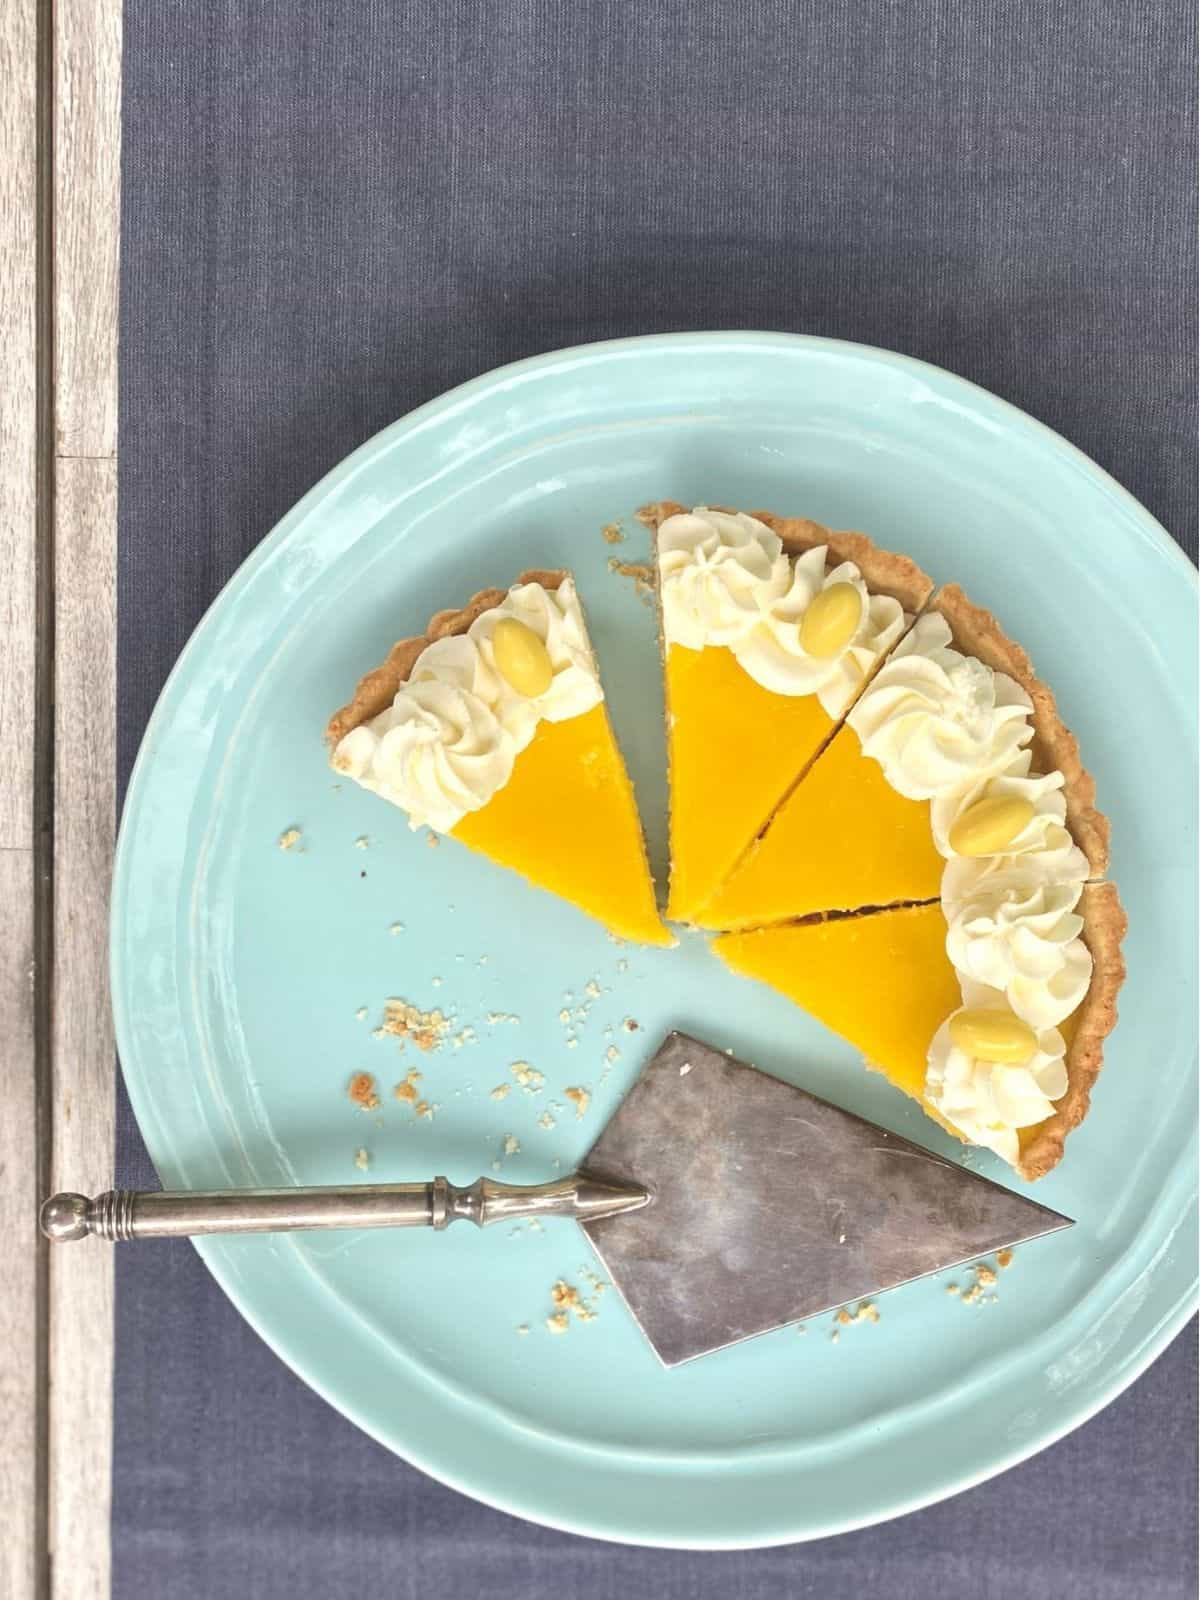 4 slices of lemon tart with whipped cream on blue plate